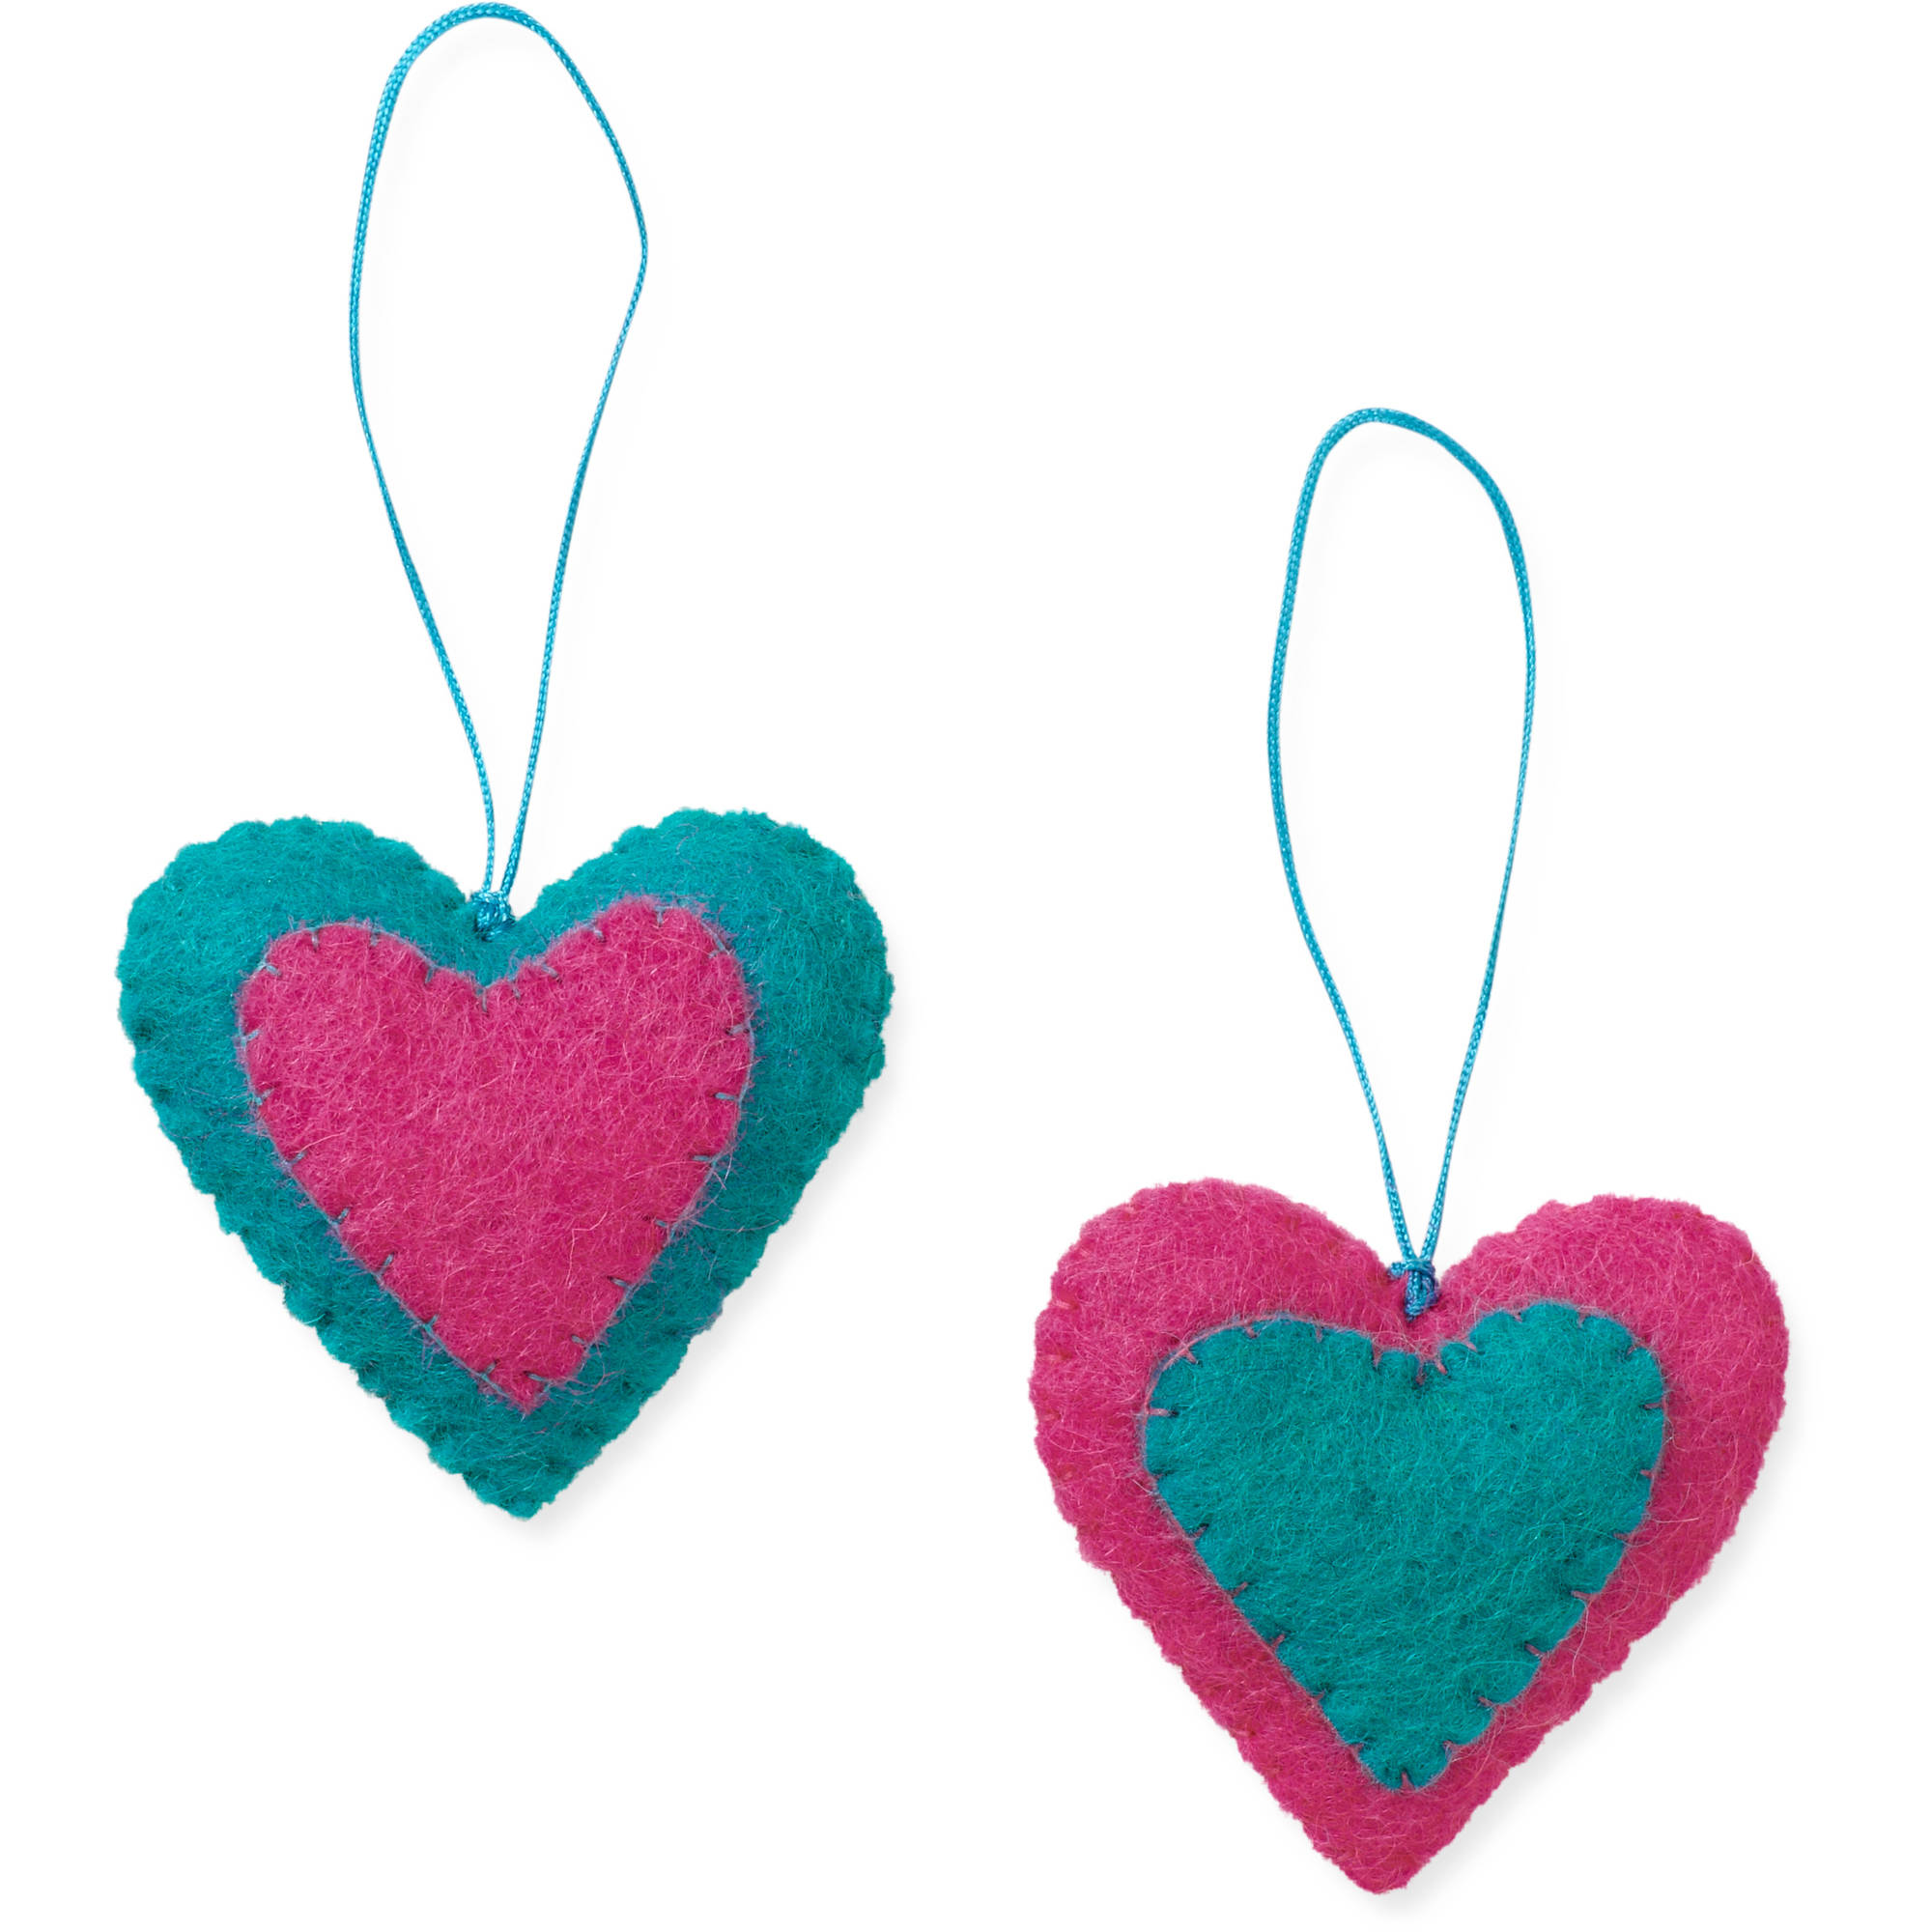 2-Piece Heart Ornament Set by Friends Handicrafts for Global Goods Partners